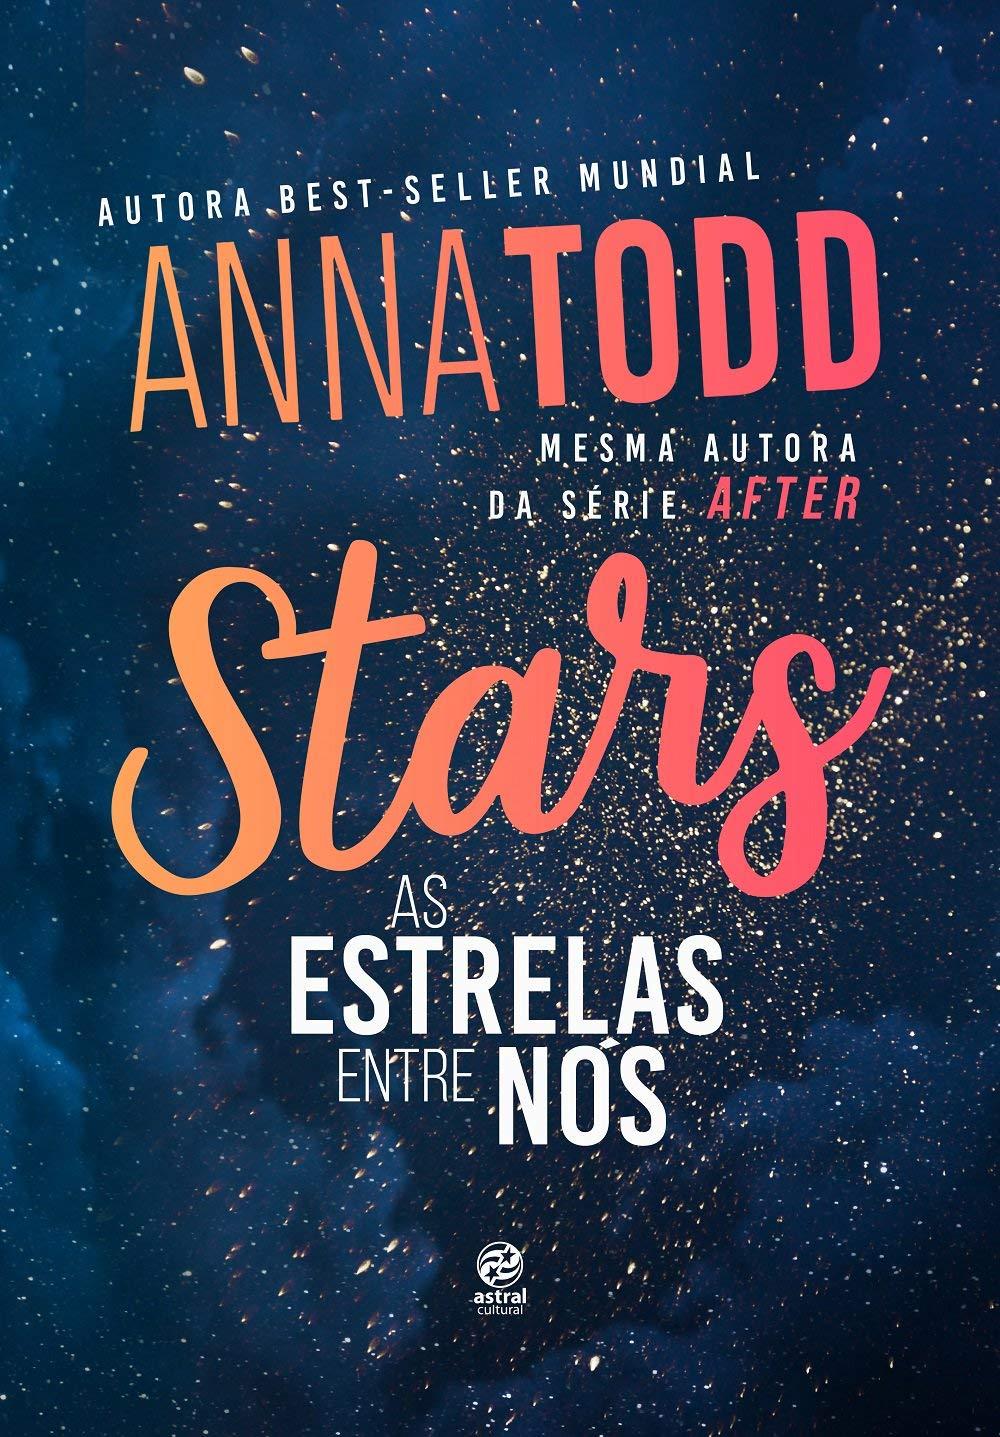 Stars - As estrelas entre nós - Livros na Amazon Brasil- 9788582467831